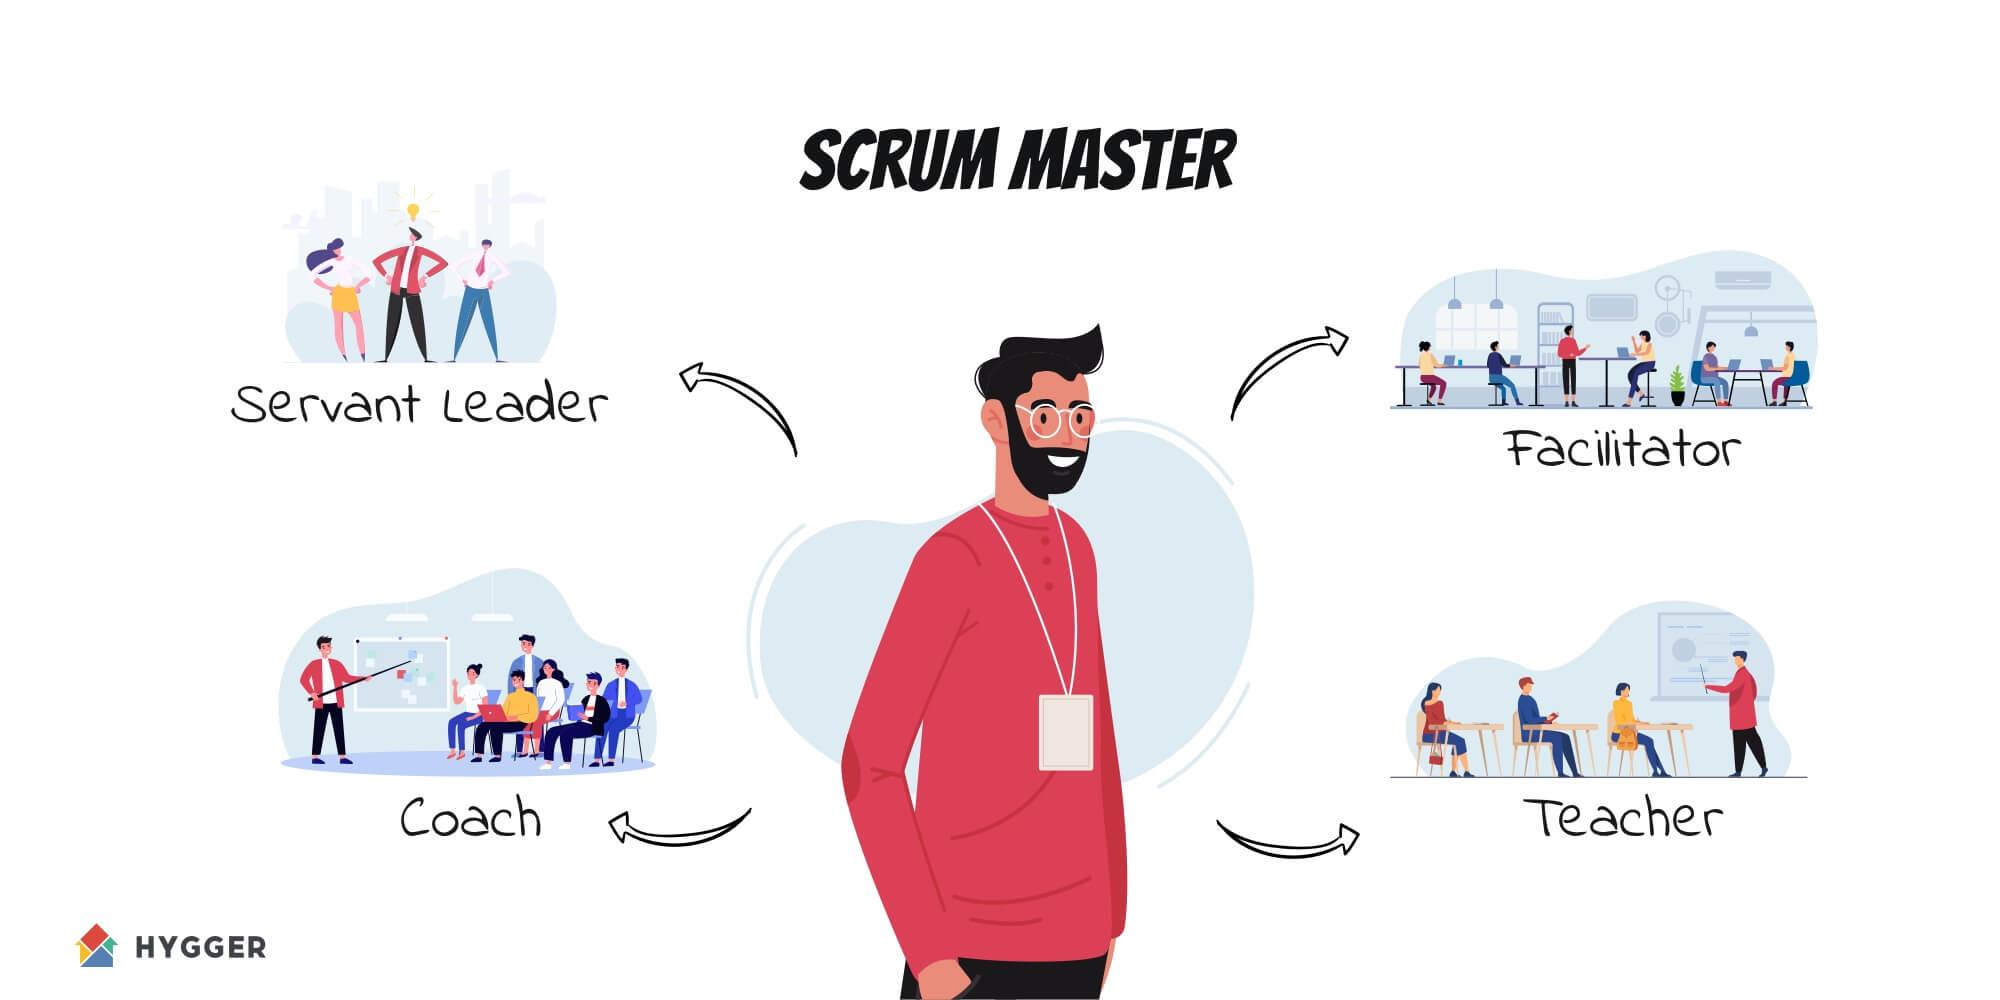 Scrum masters duties